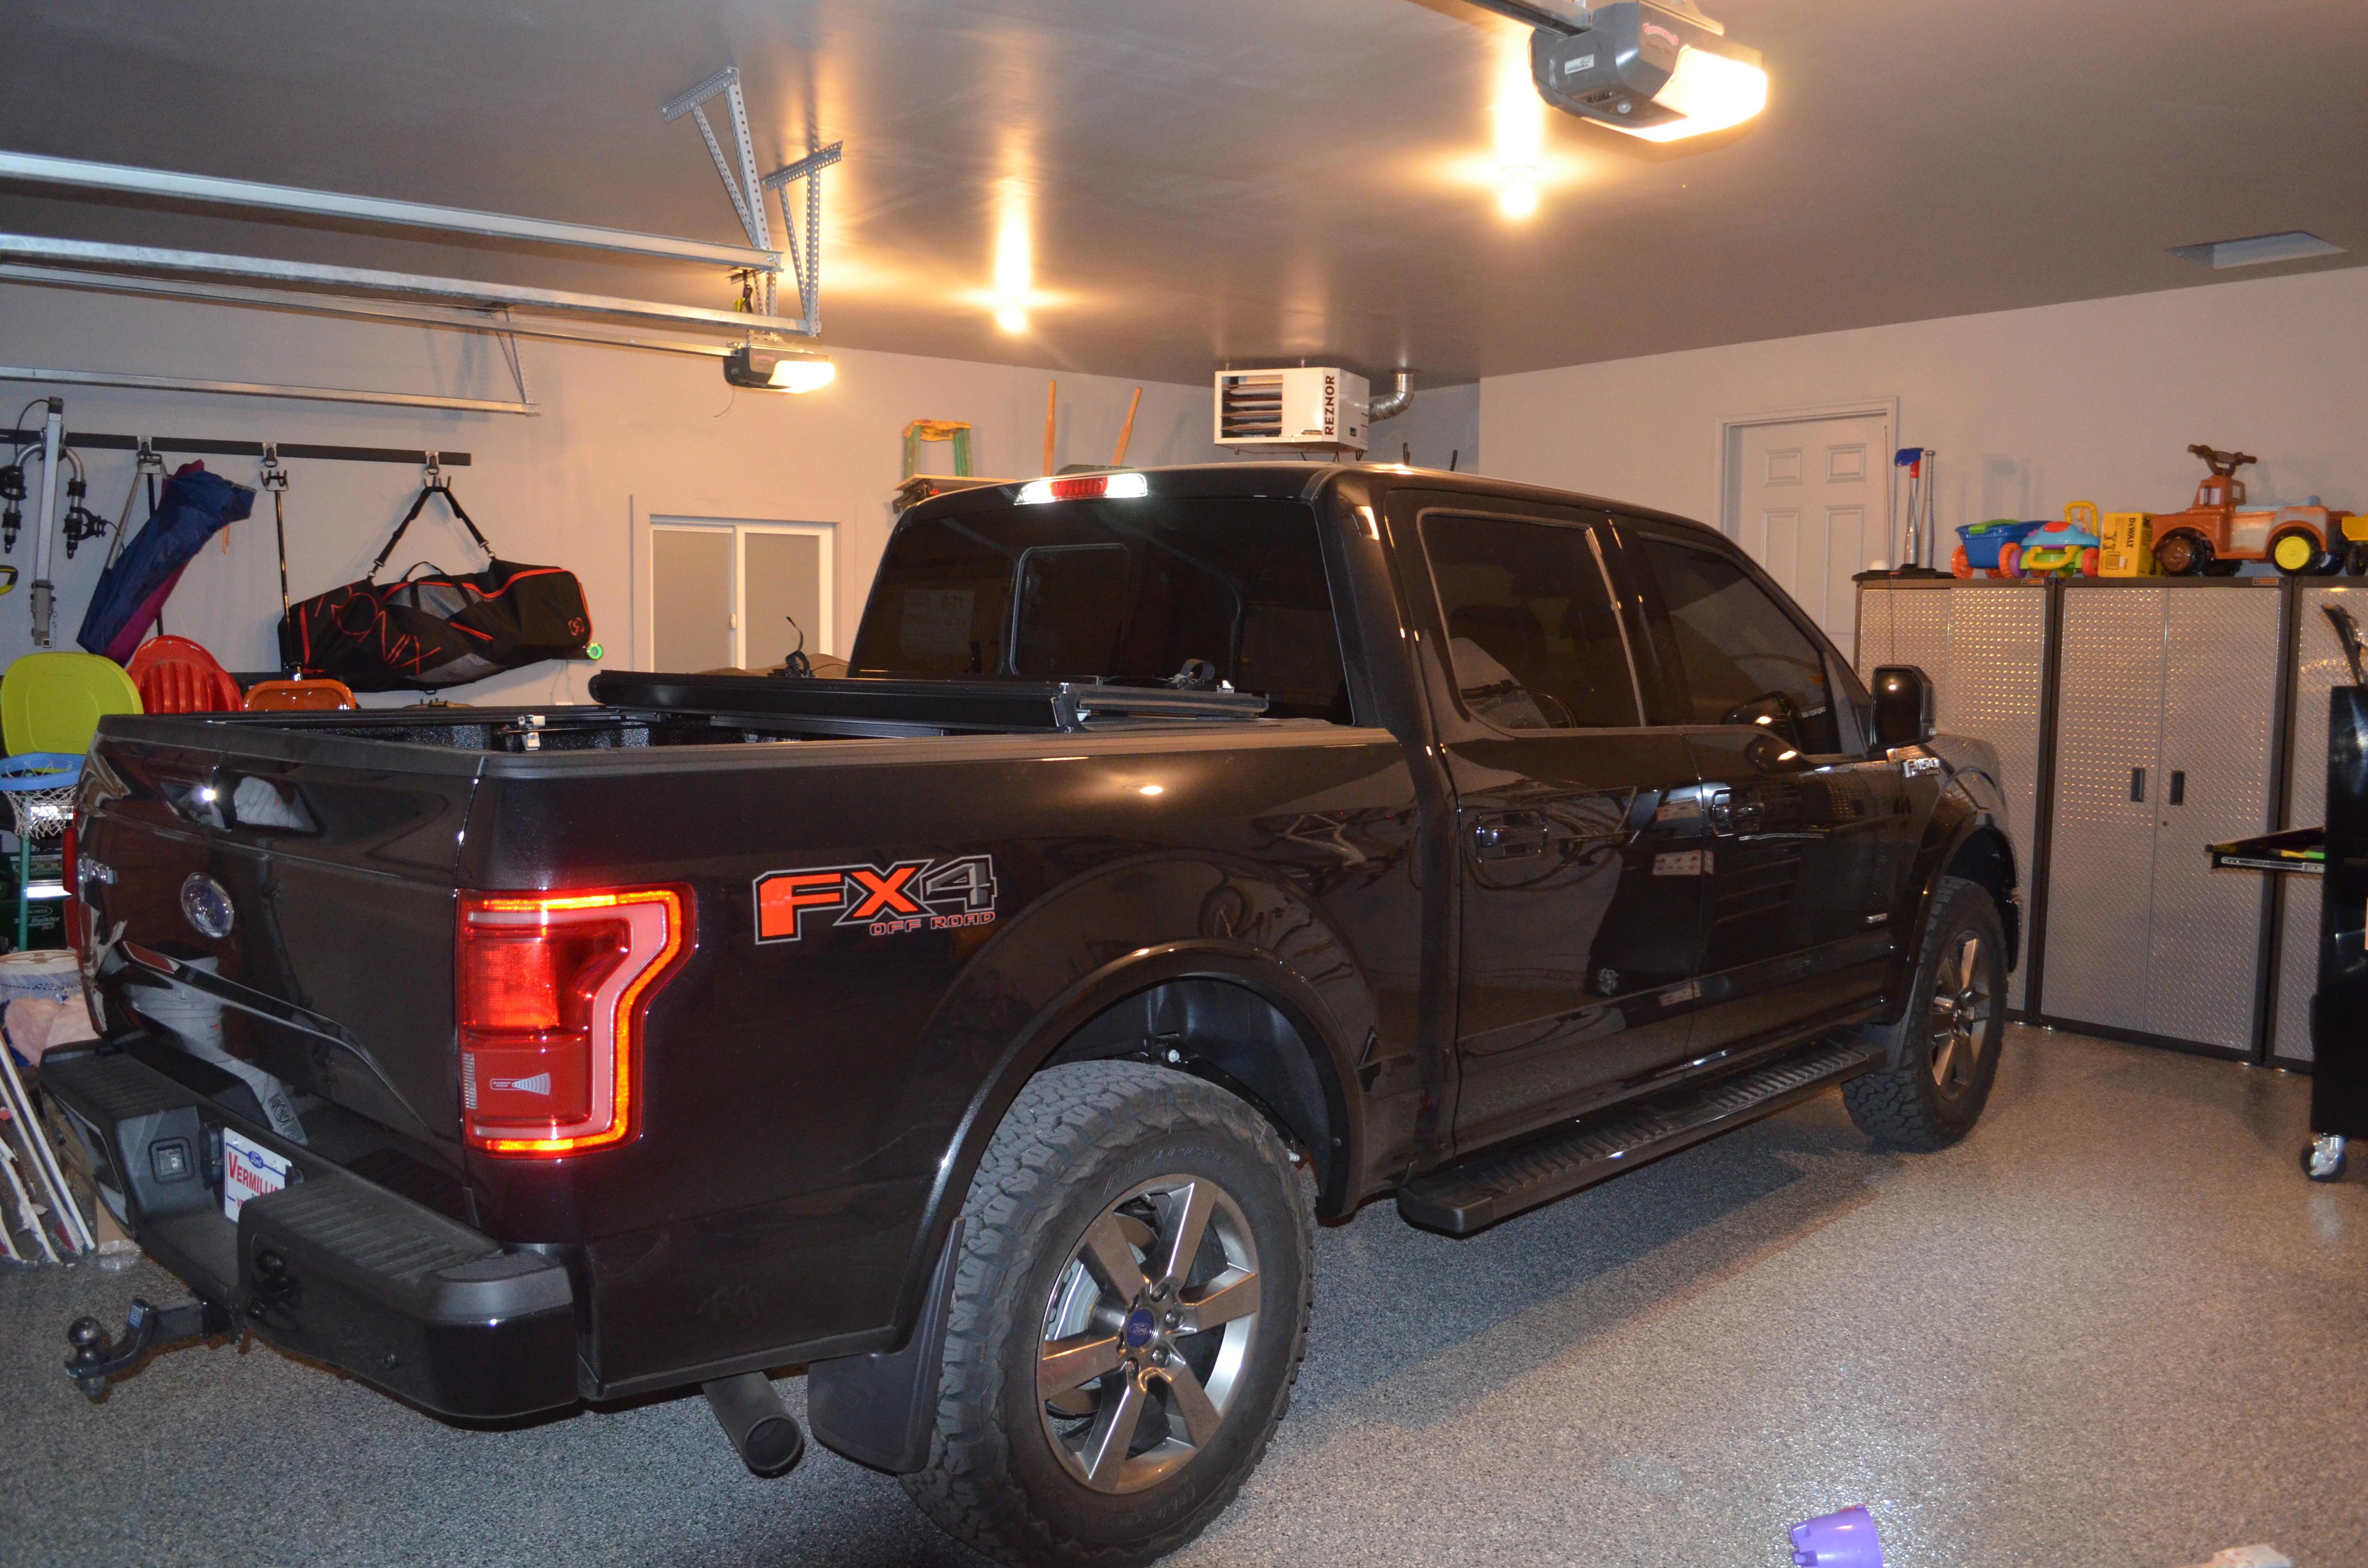 2015 Lariat 35 Inch Tires 2 Quot Ready Lift Kit